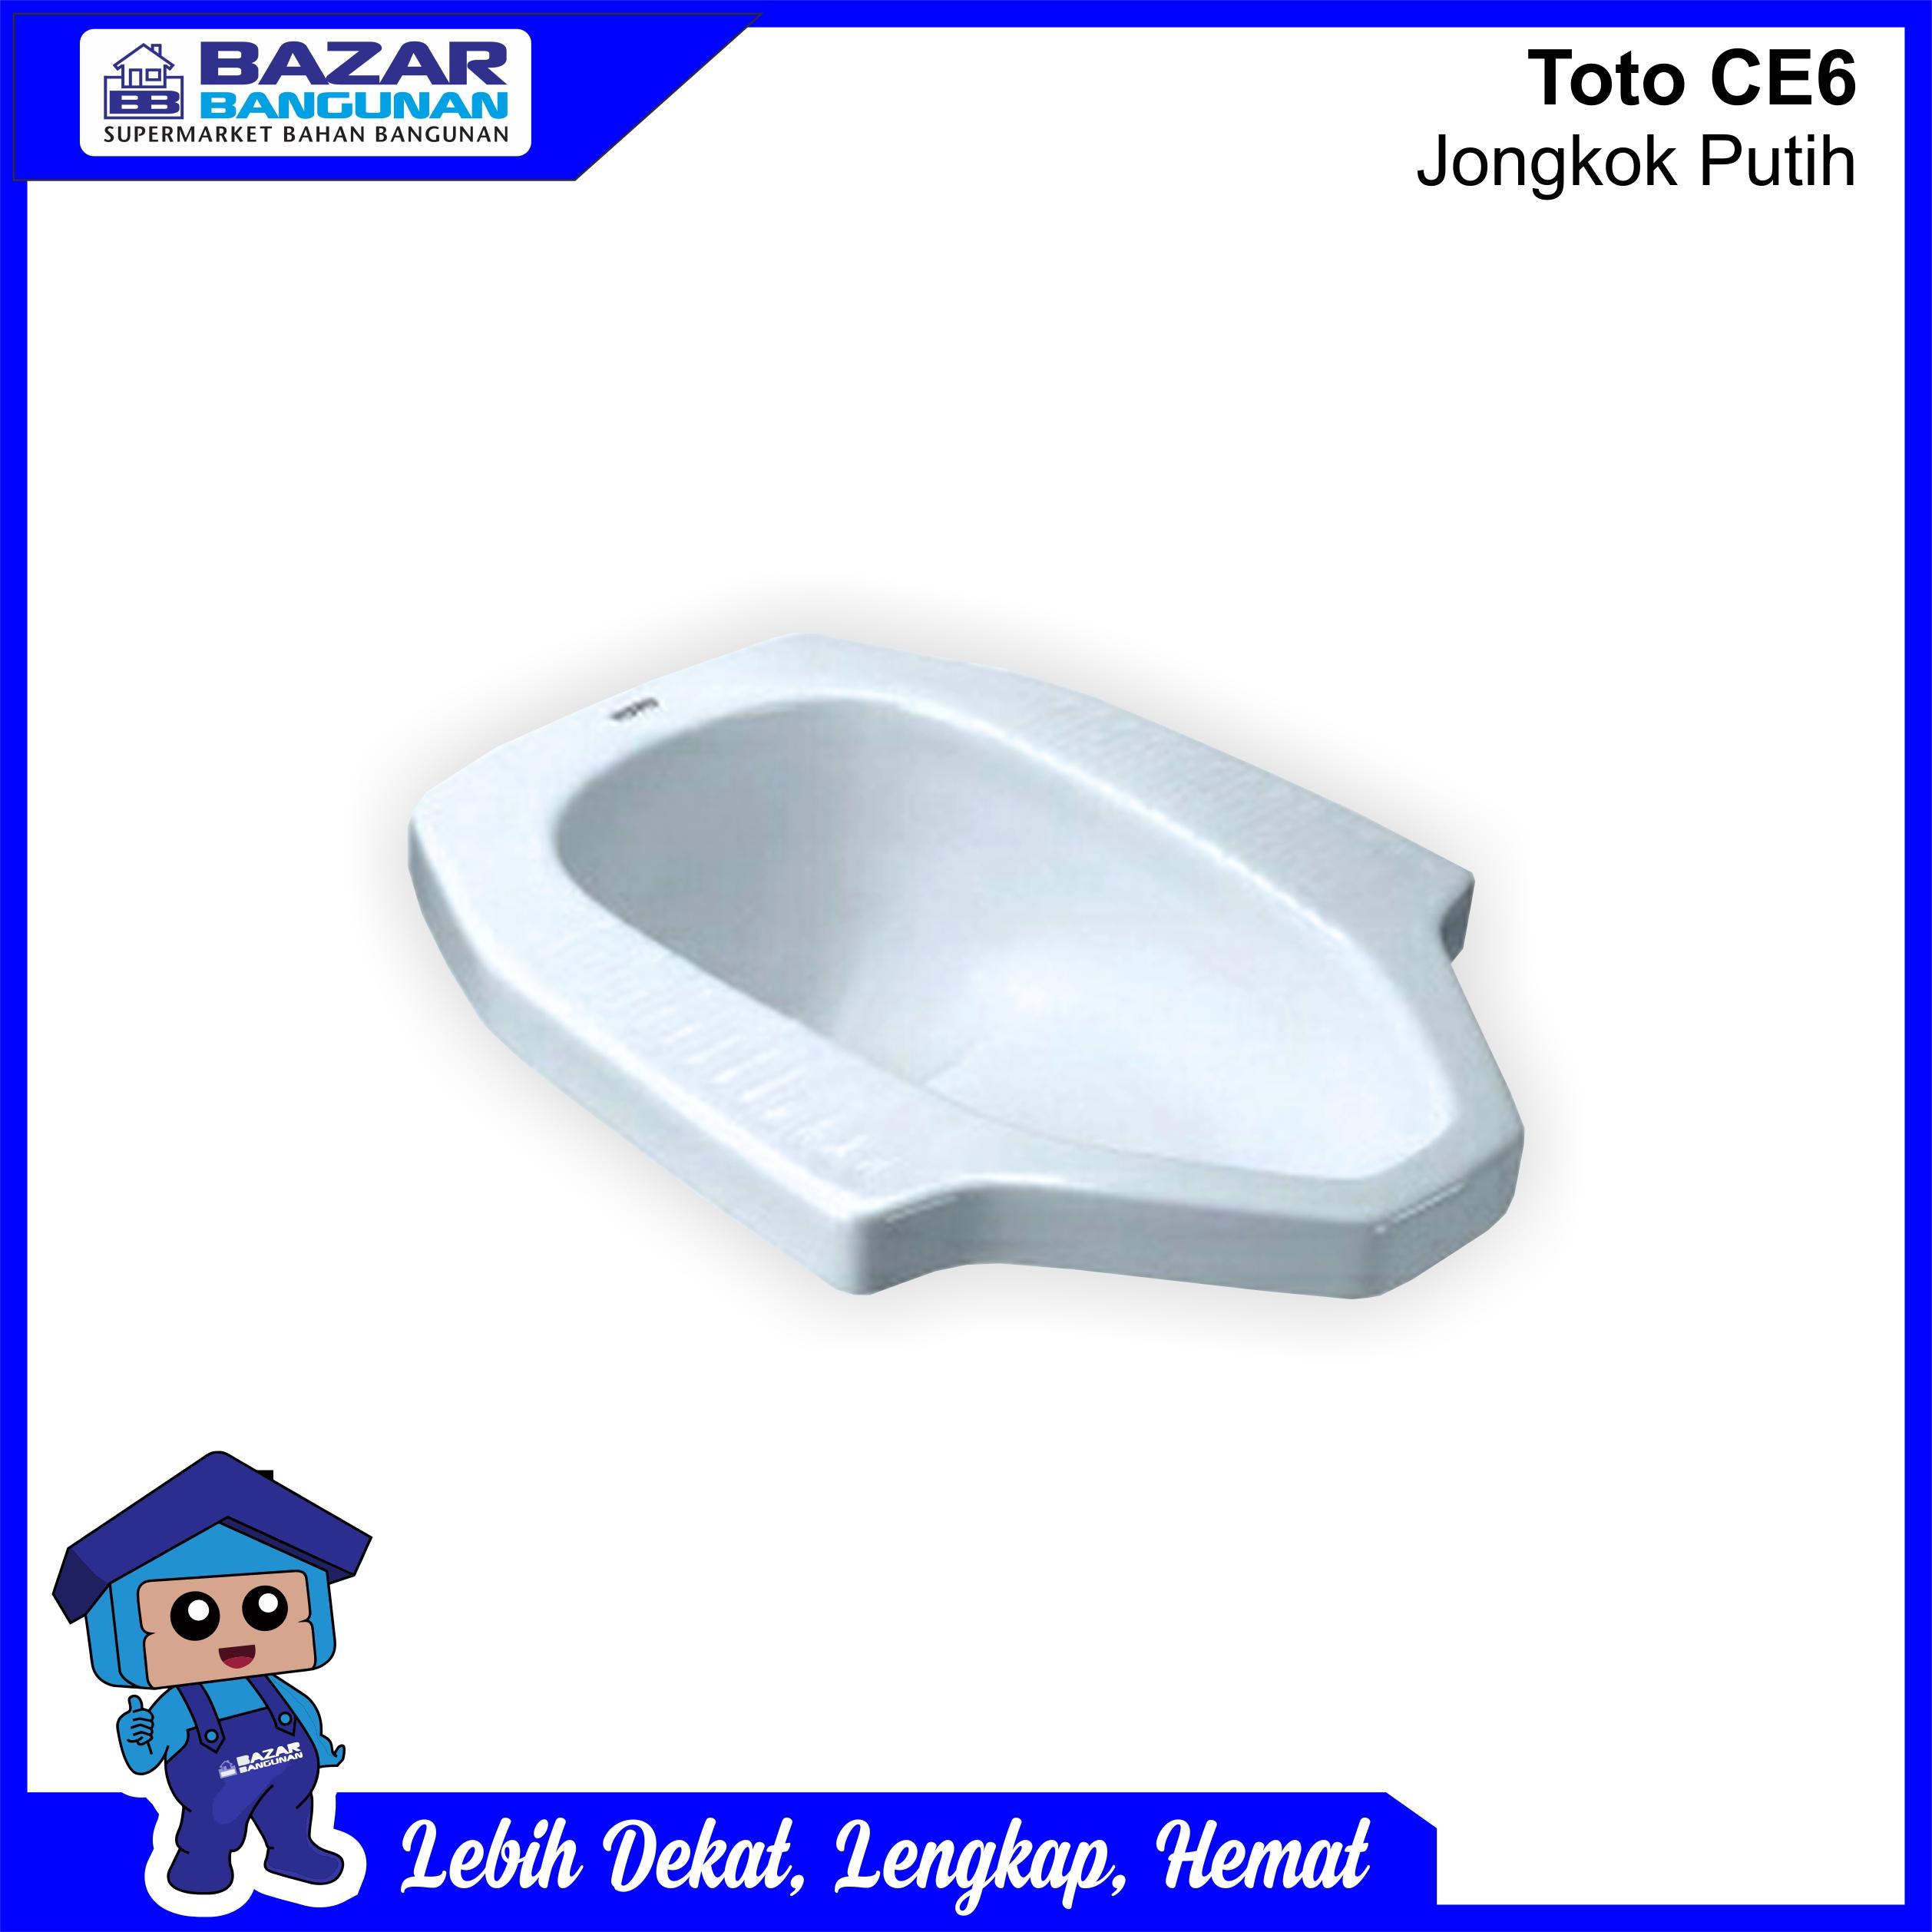 Closet Kloset Jongkok Toilet Squat Toto Ce 6 Ce6 White Putih Lazada Indonesia Harga closet jongkok toto